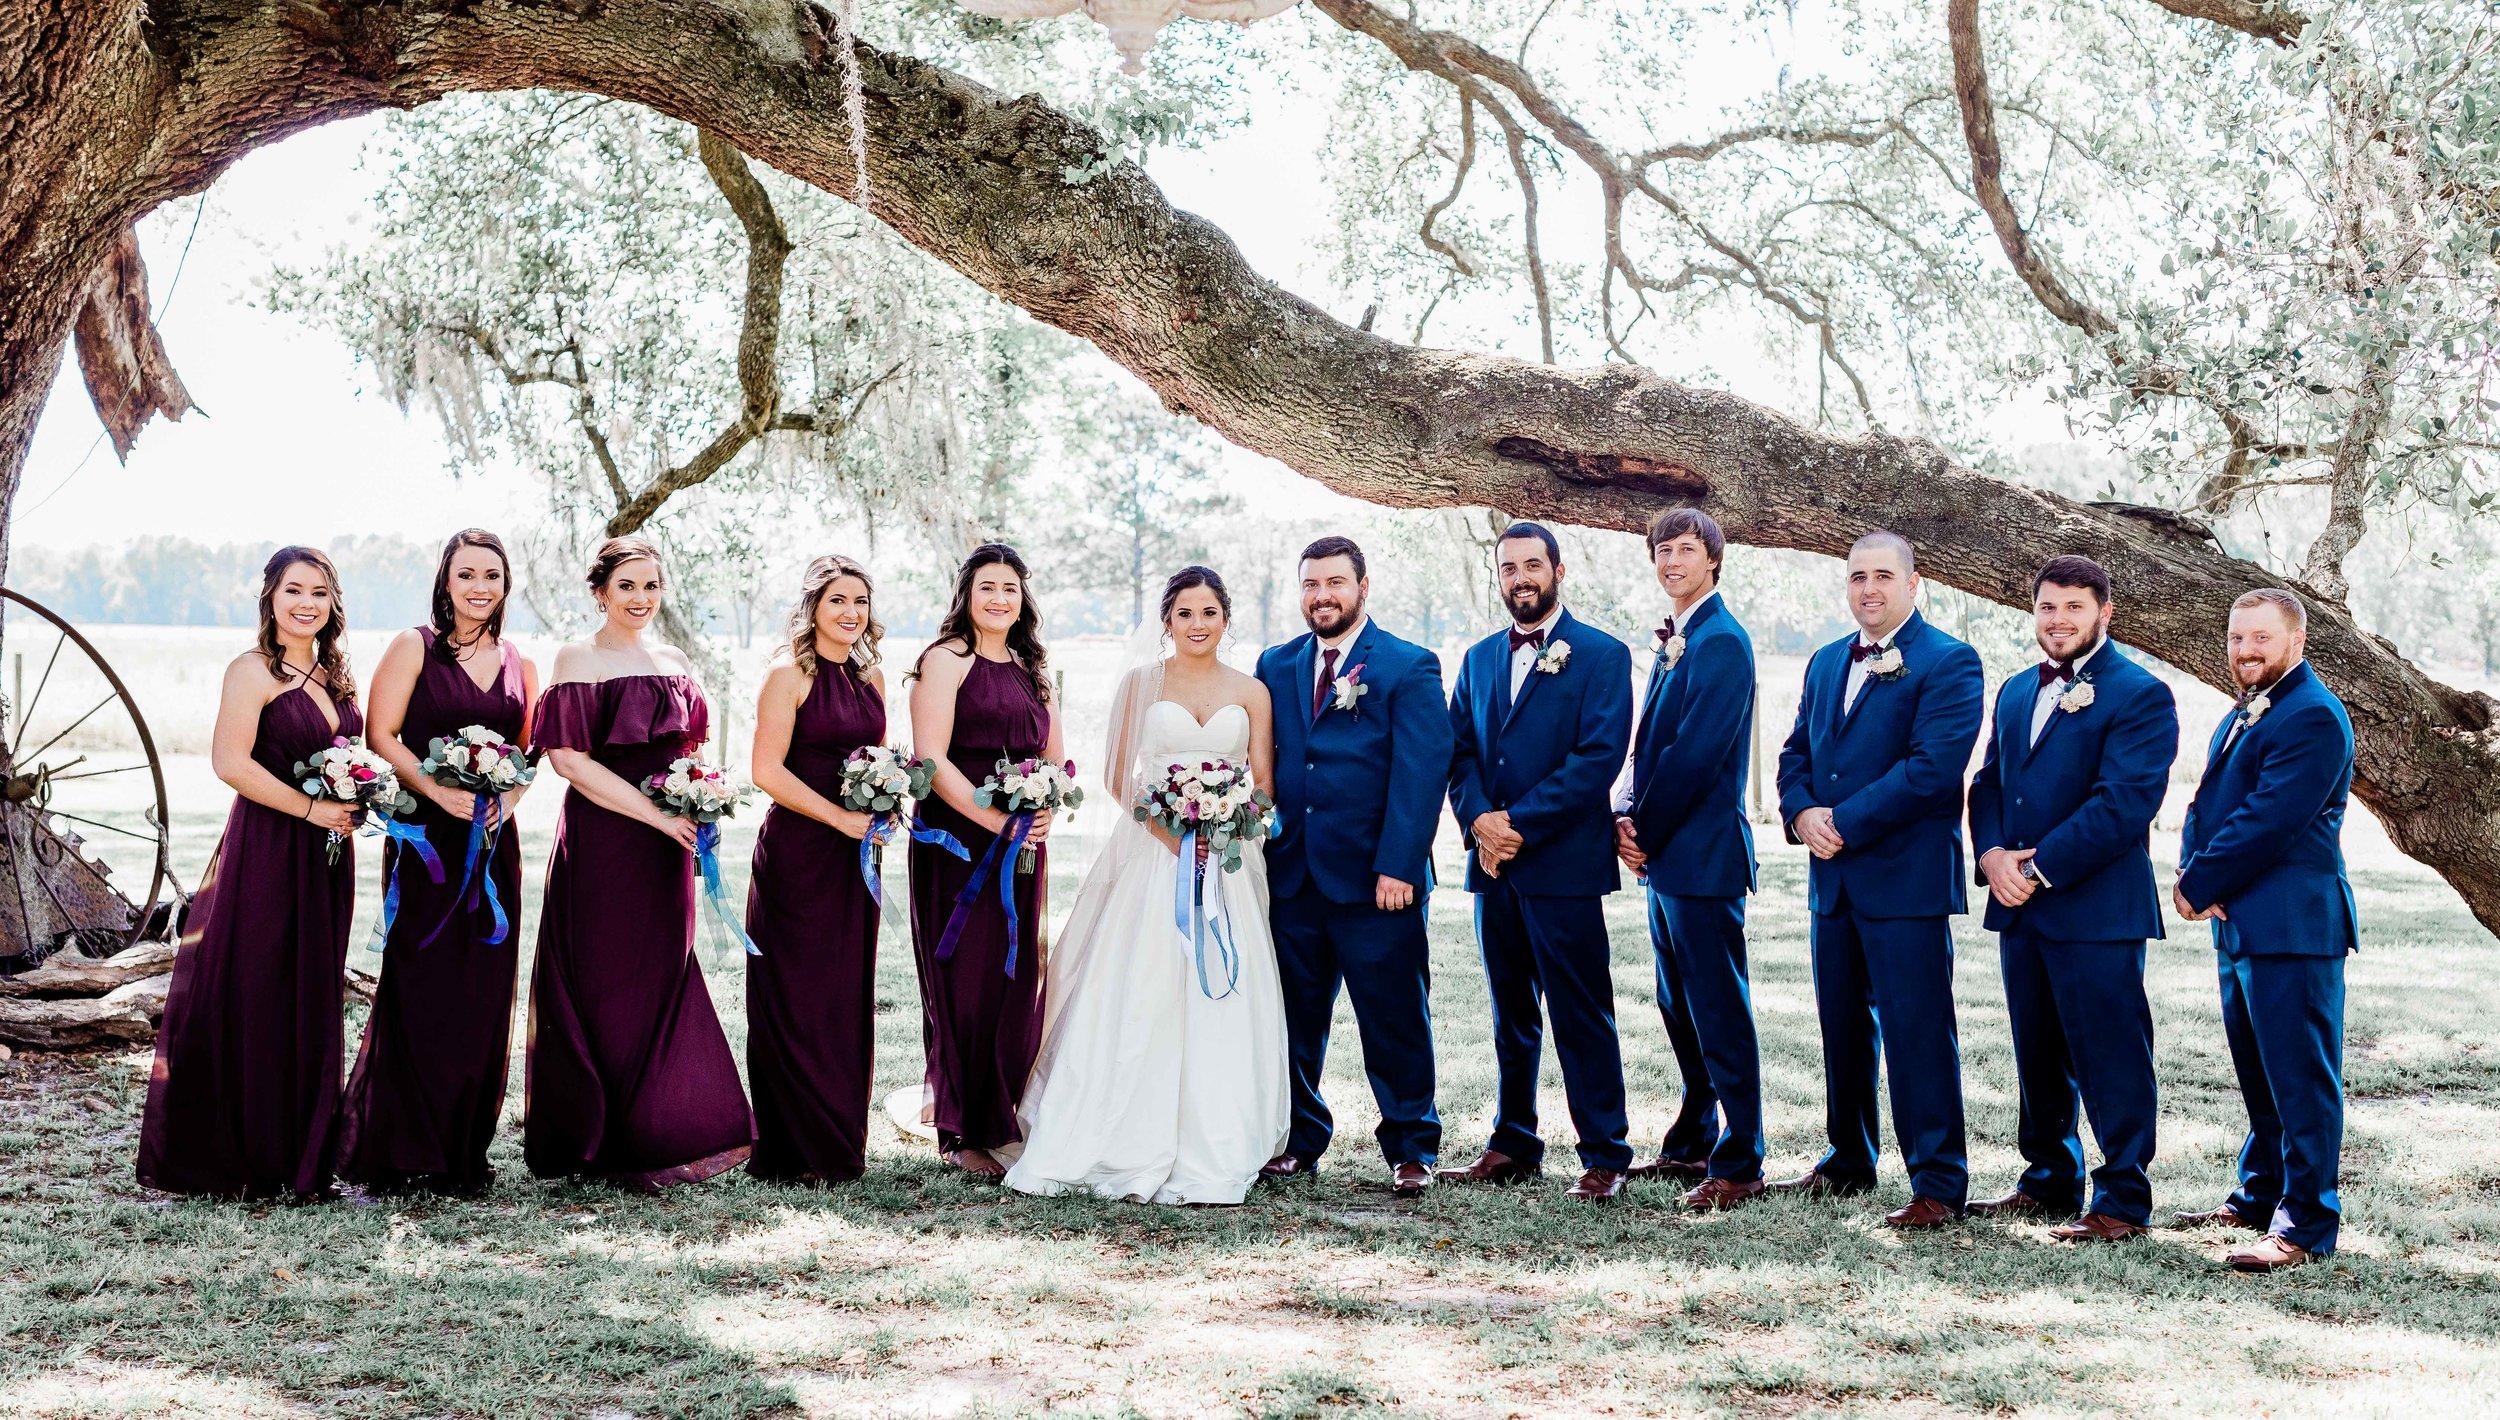 20190427-Southern Lens Photography- Savannah Wedding Photographer-Screven and Caroline-201955.jpg